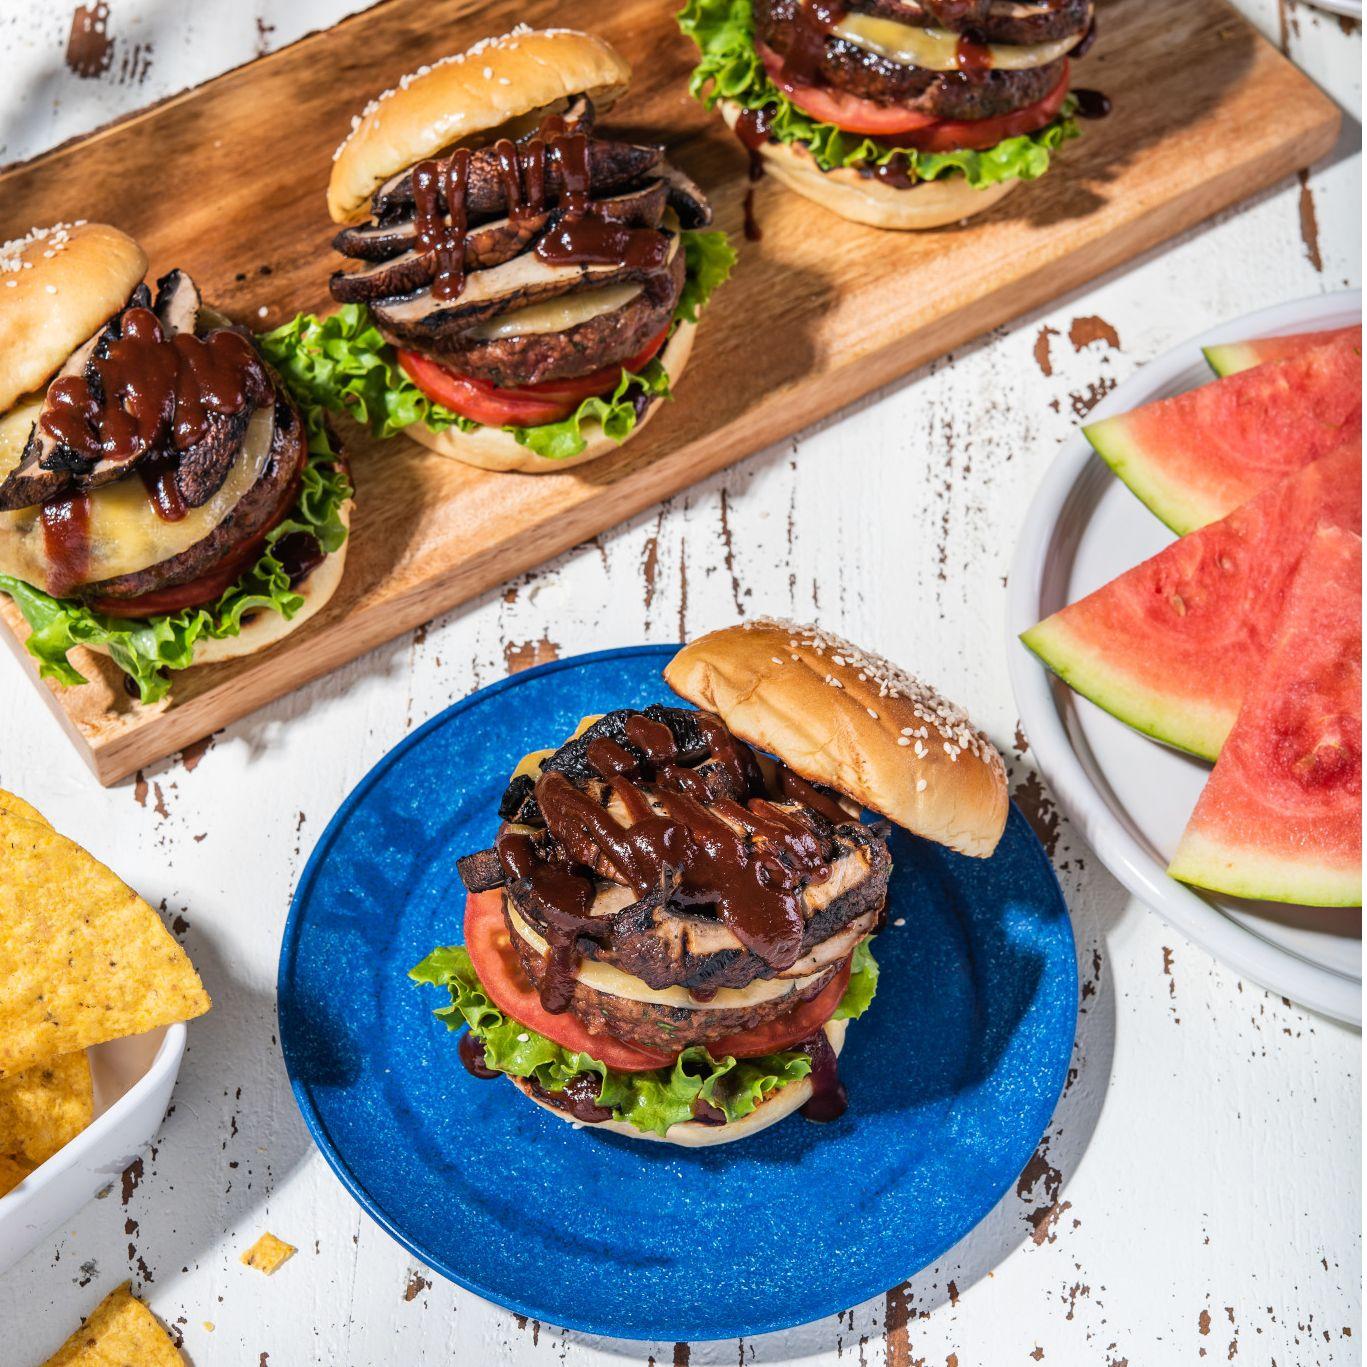 BBQ Burgers with Smoked Gouda & Portobellos